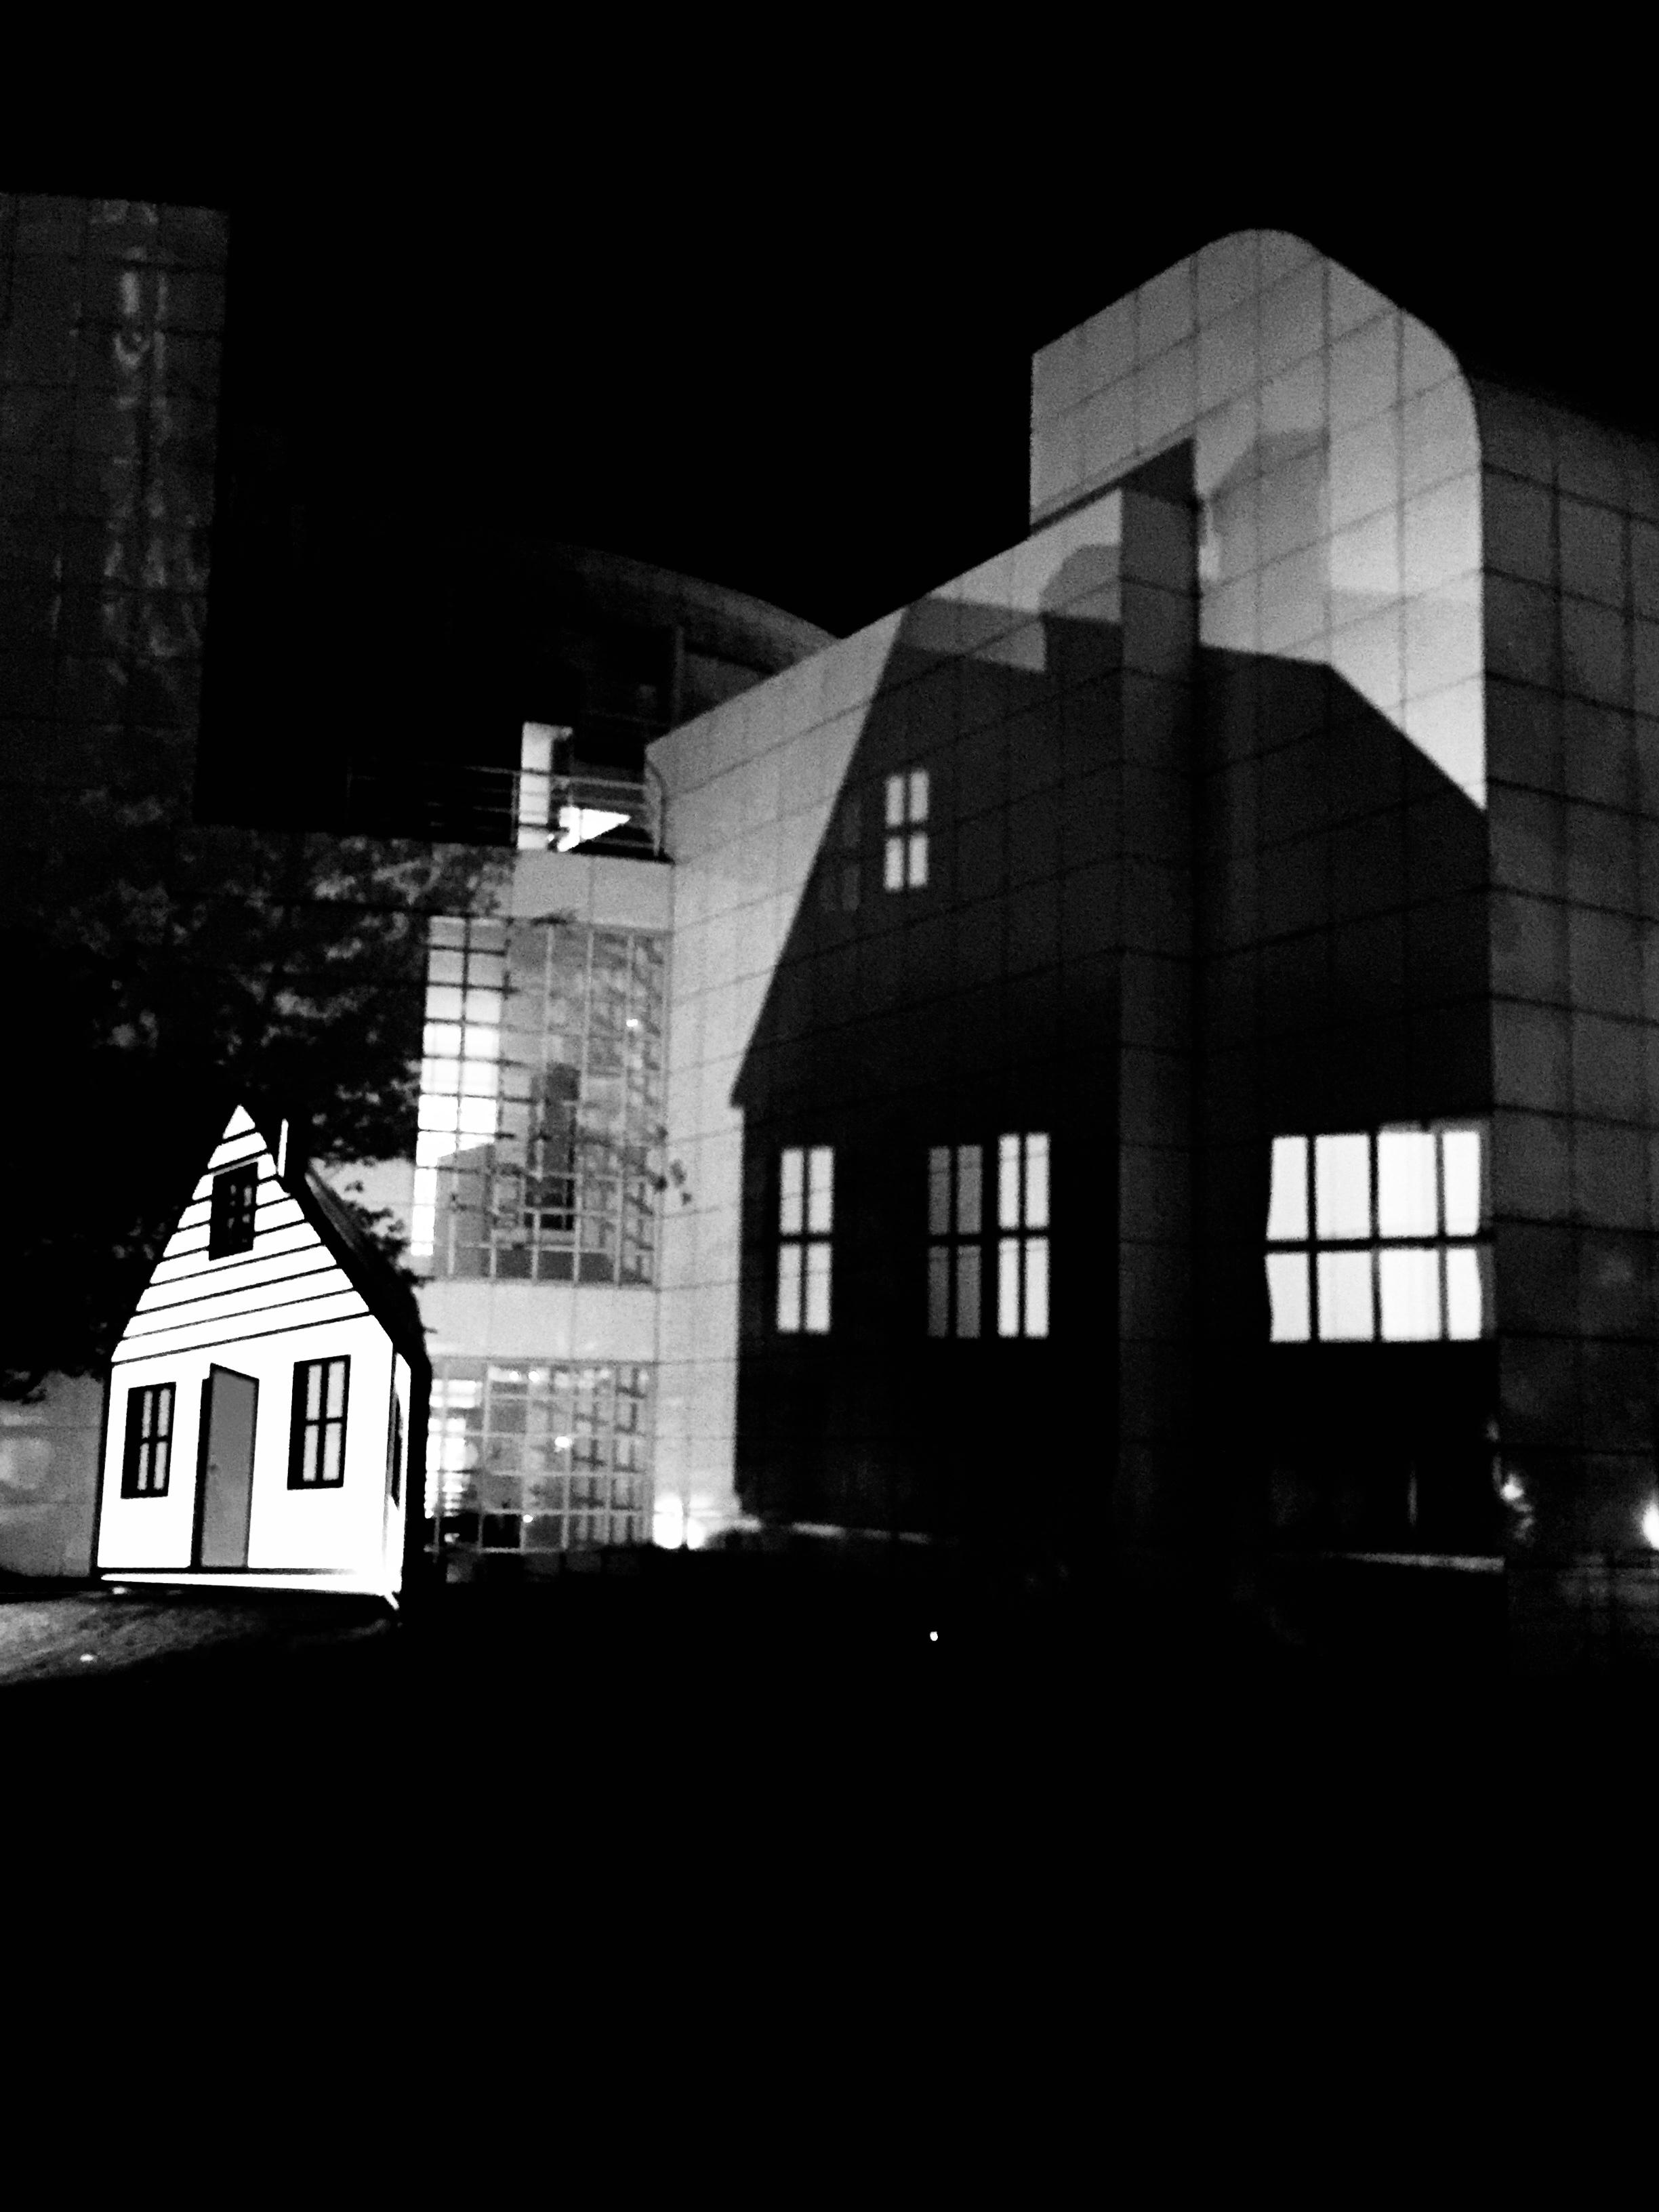 Wooddruff Arts Center Black and White.jpg